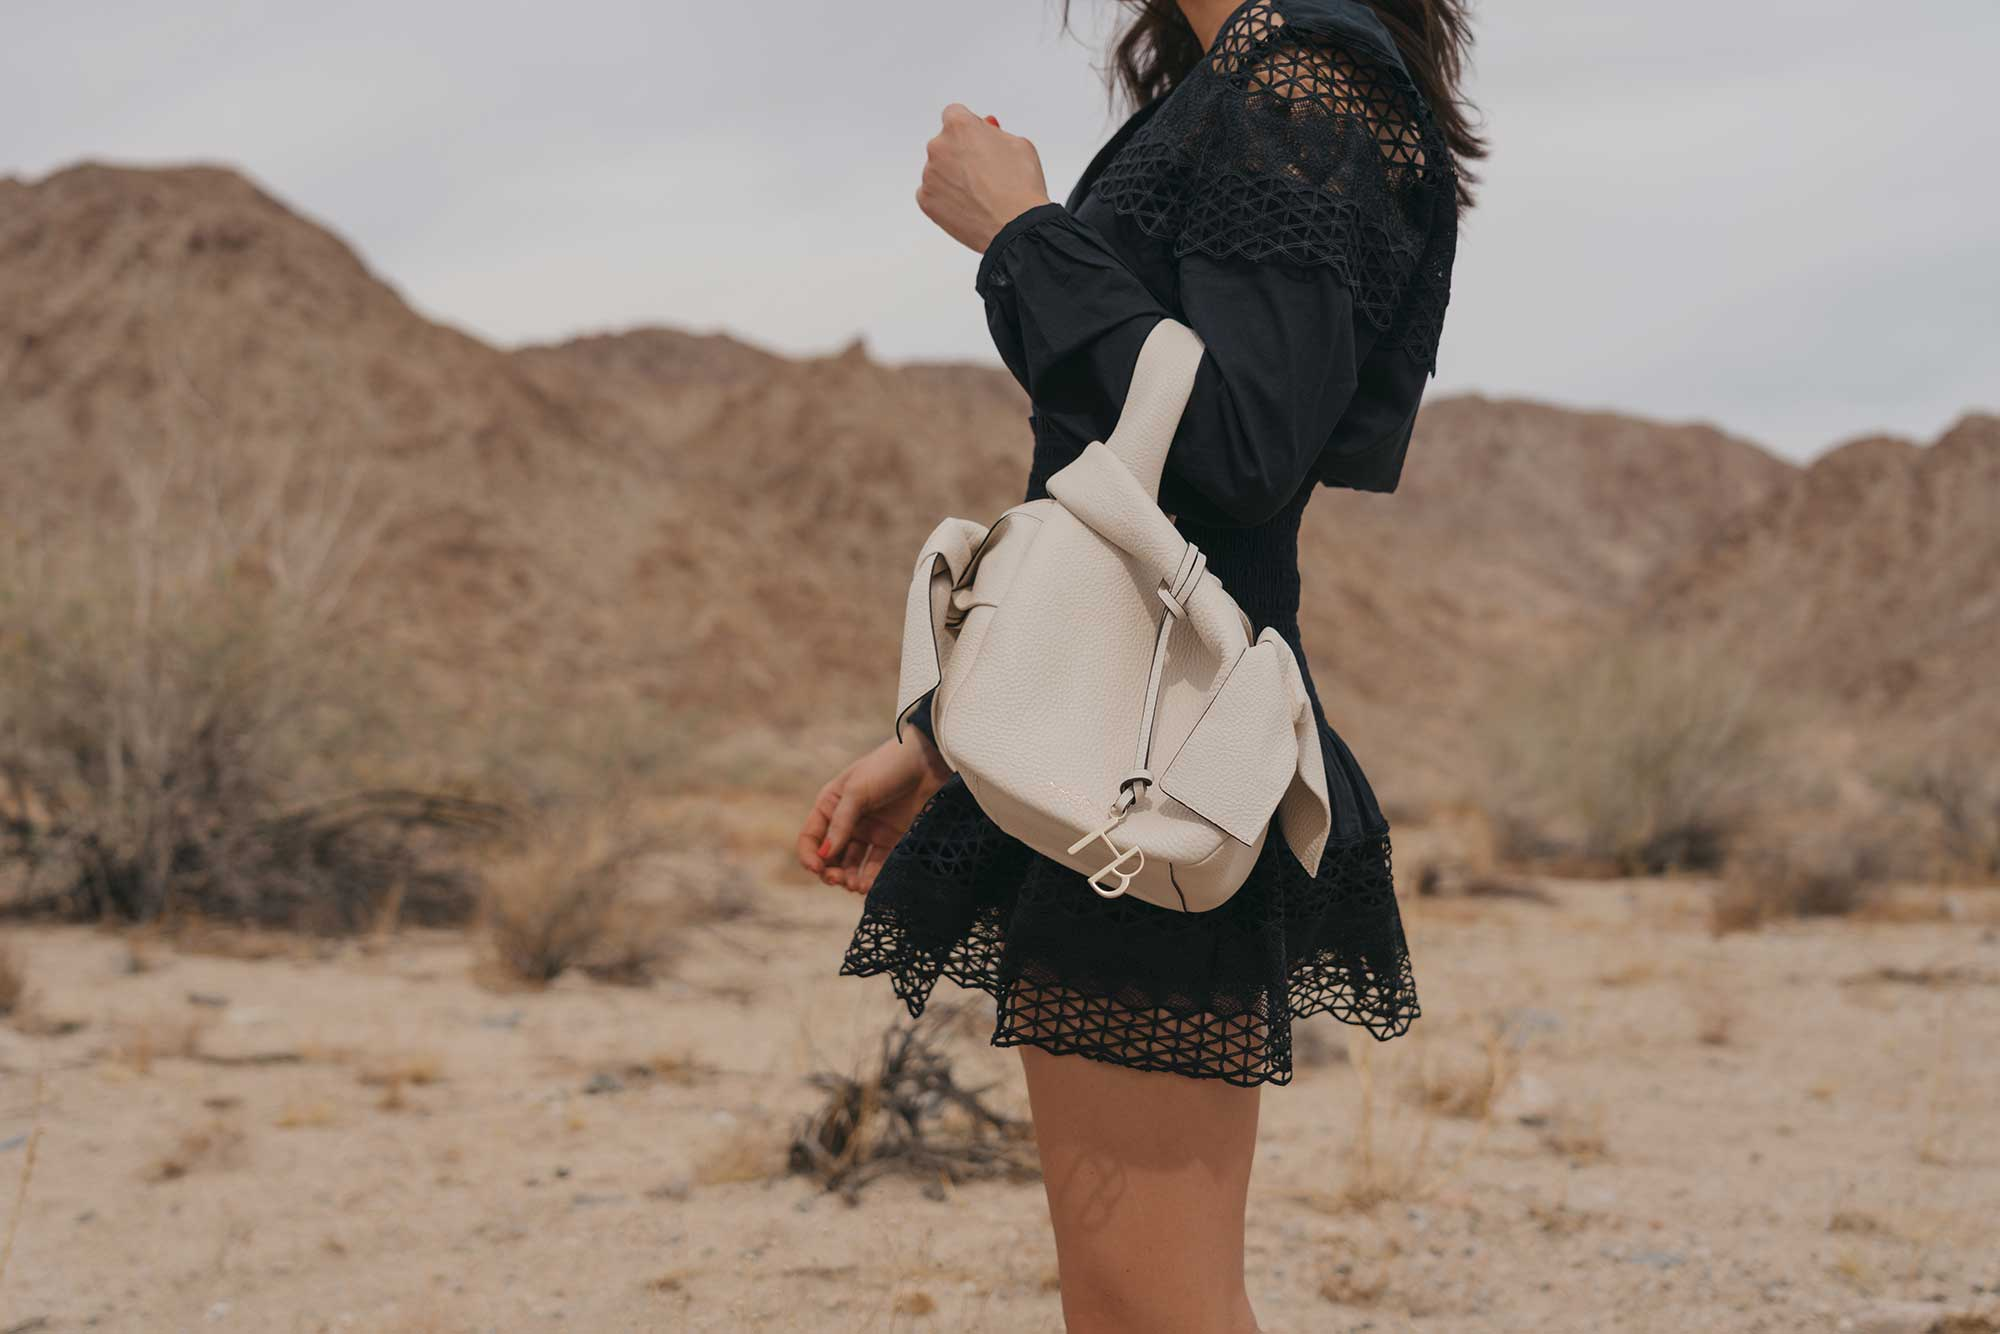 black lace festival outfit for Coachella Desert8.jpg